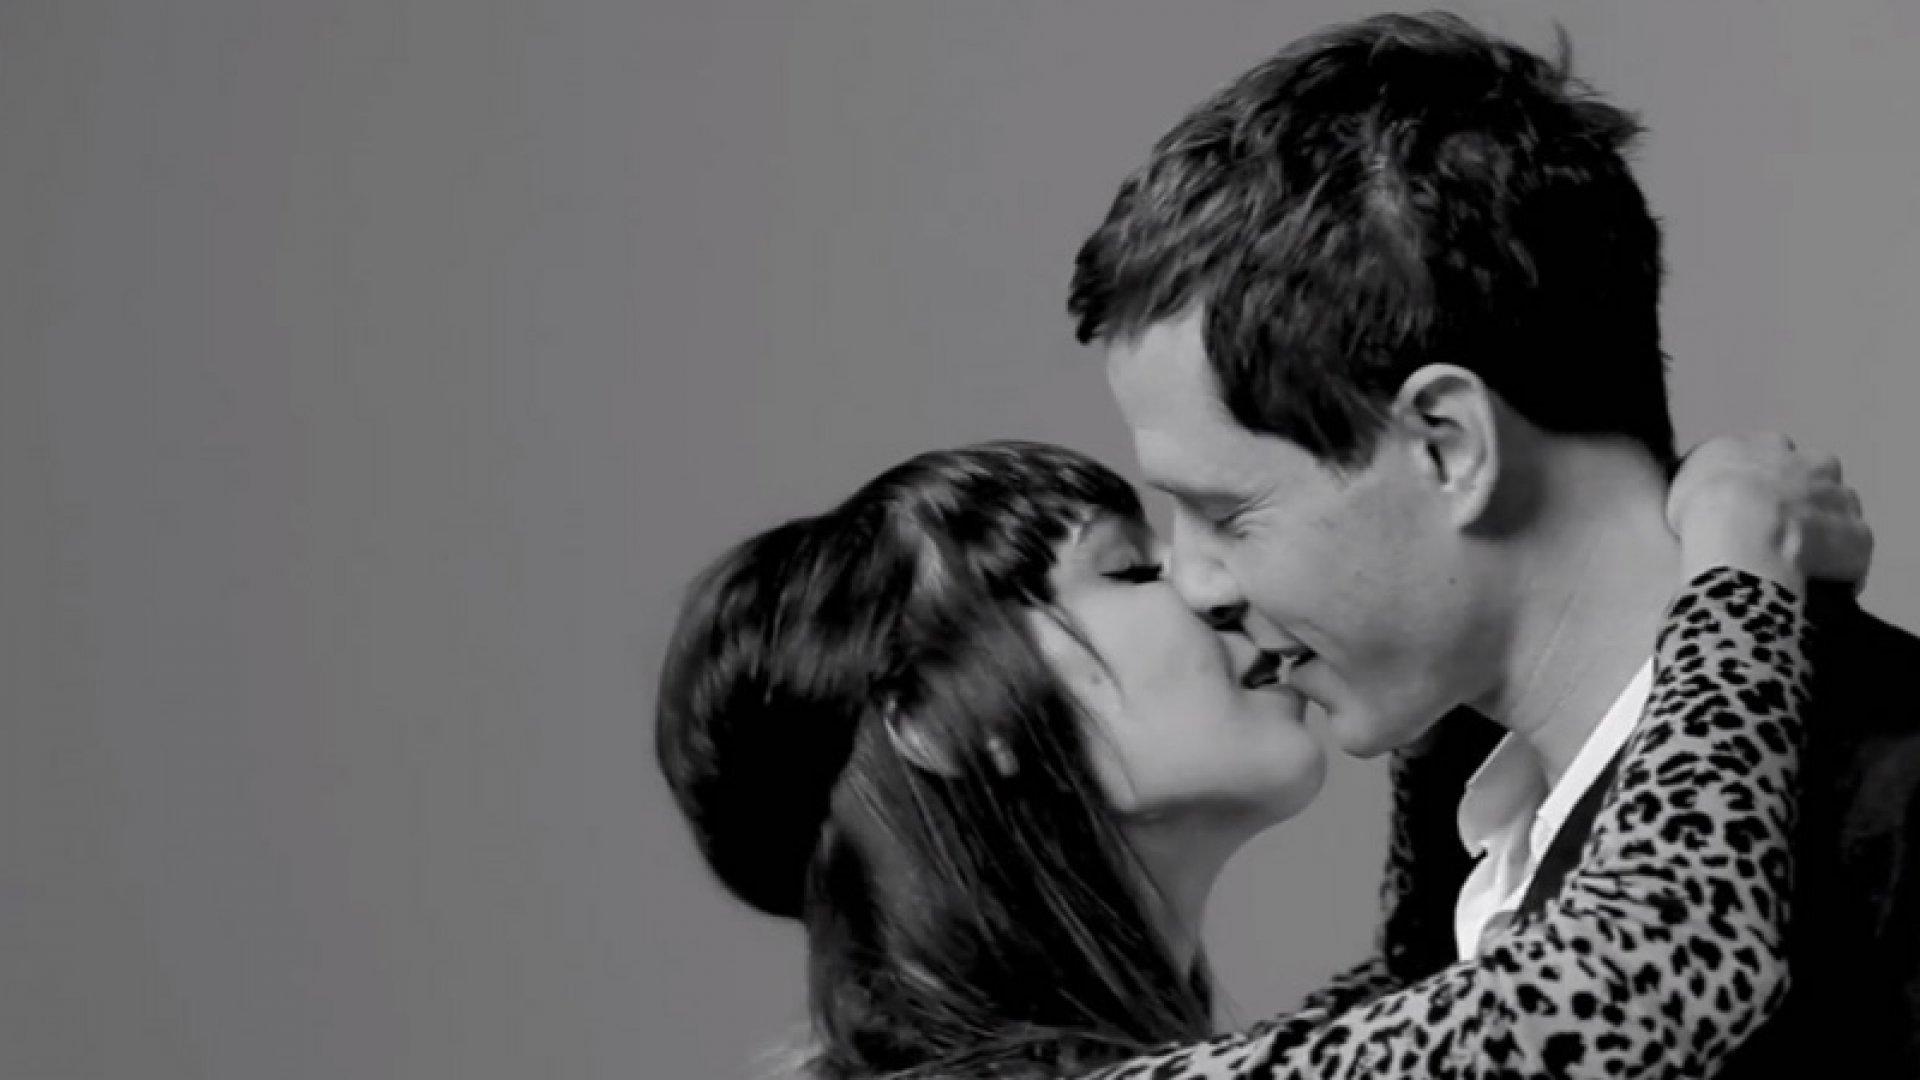 When Strangers Kiss, Do Marketers Win?